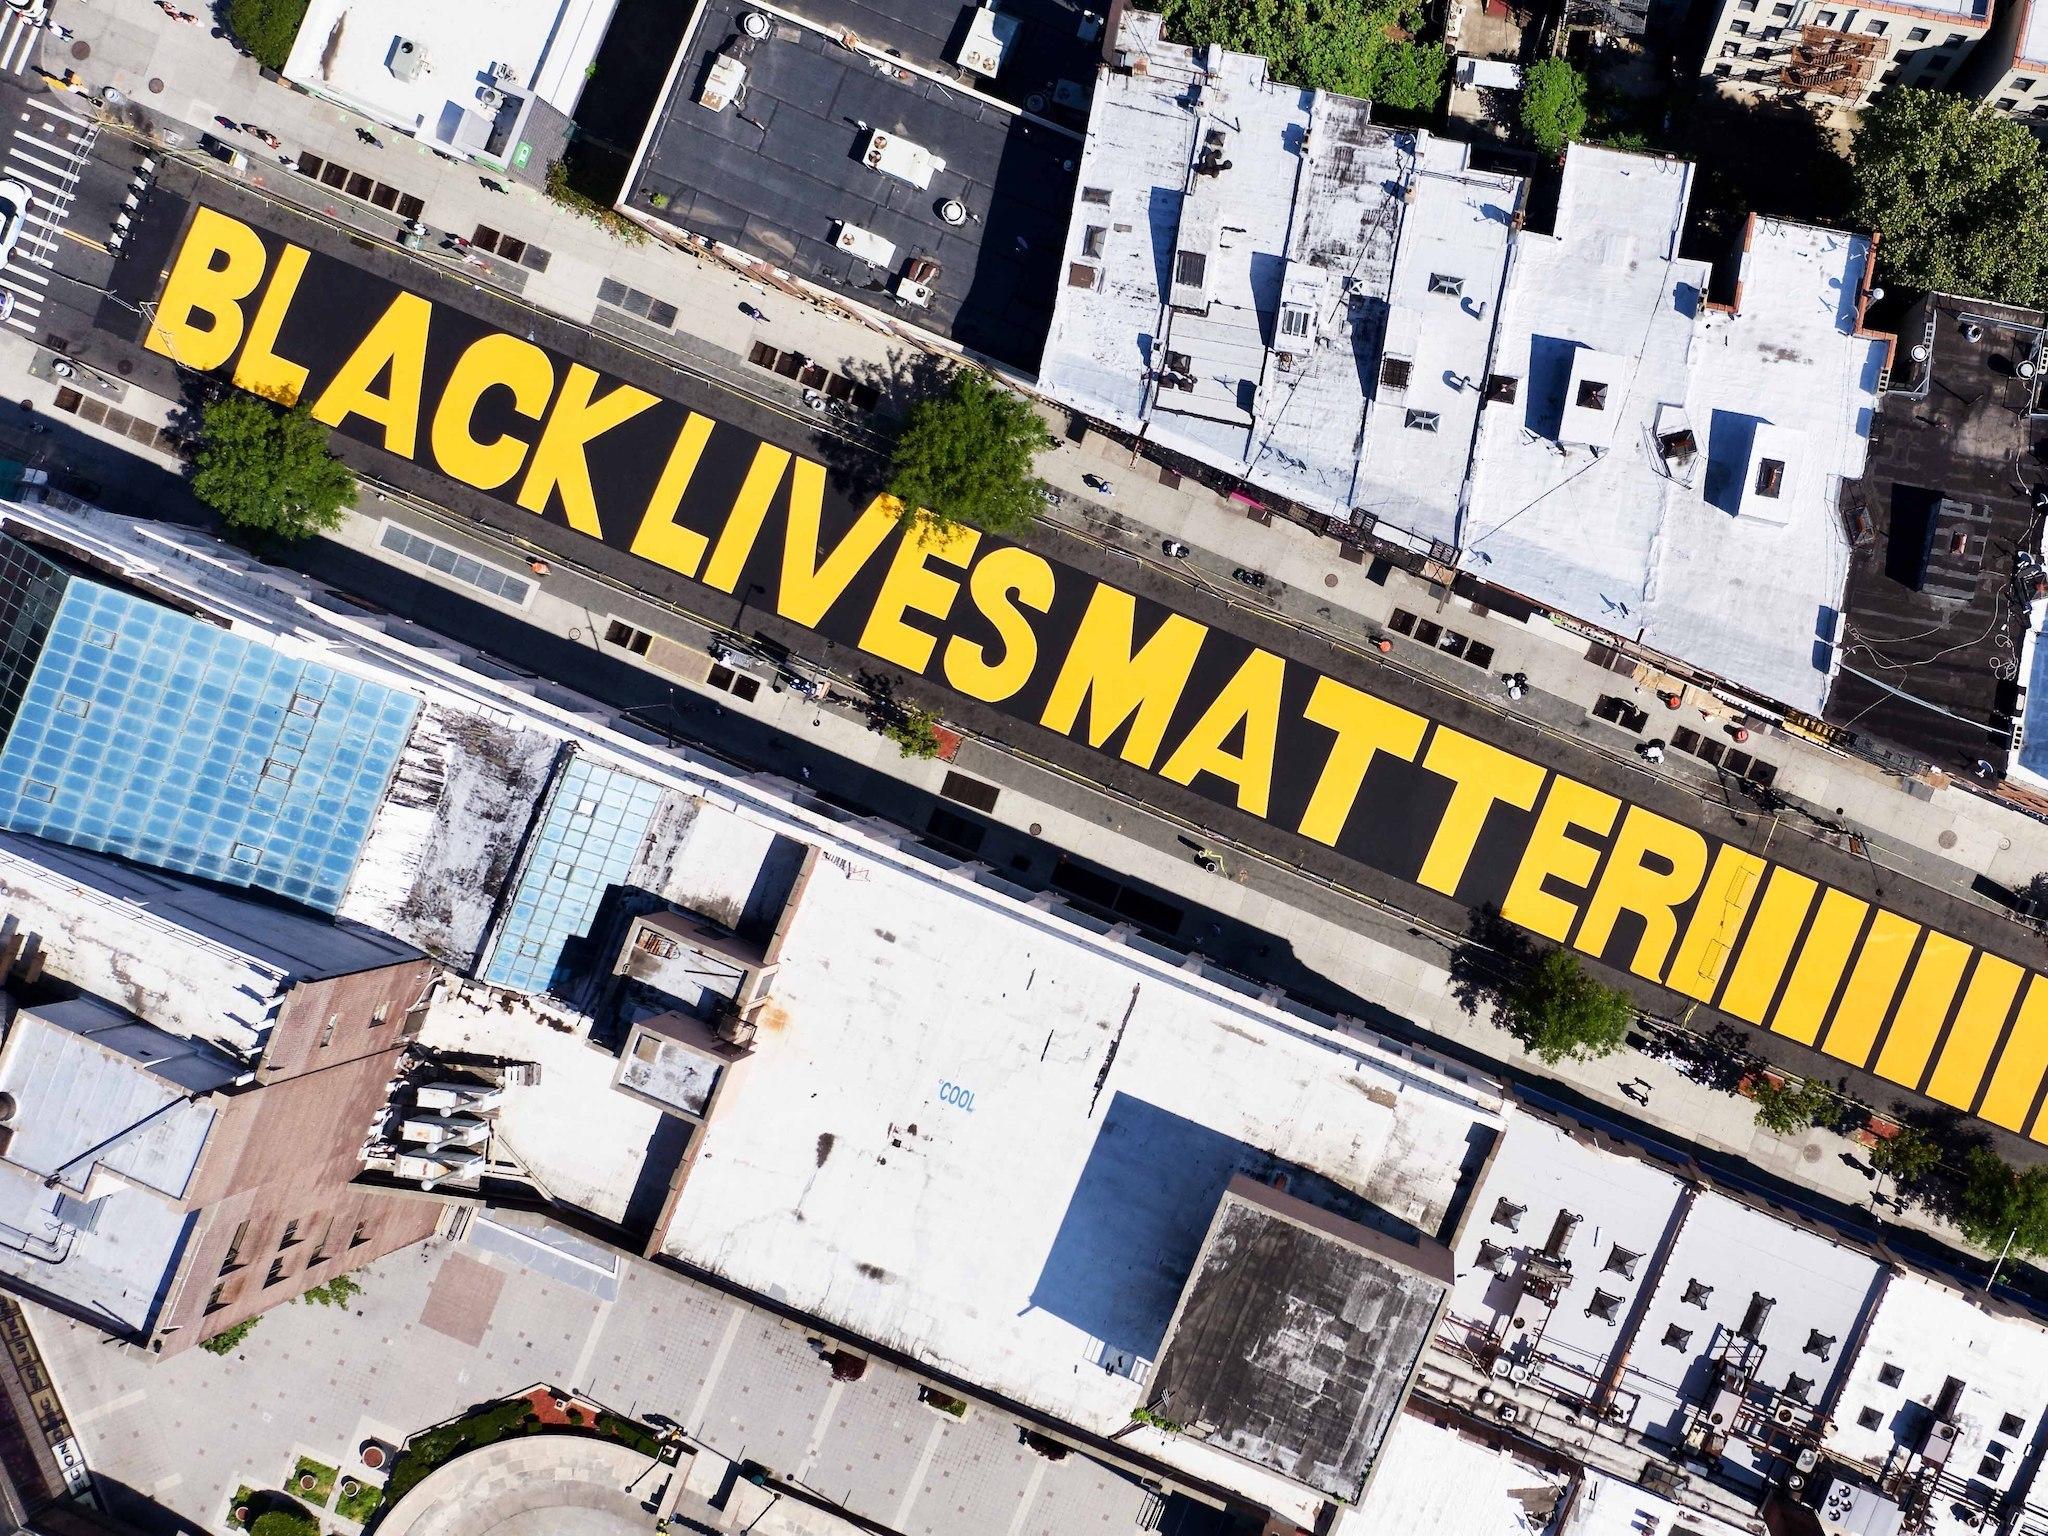 George Floyd, NYC, Black Lives Matter, murals, Washington D.C., Oakland, CA, Brooklyn, Harlem, Adam Clayton Powell Jr. Boulevard, Mayor De Blasio